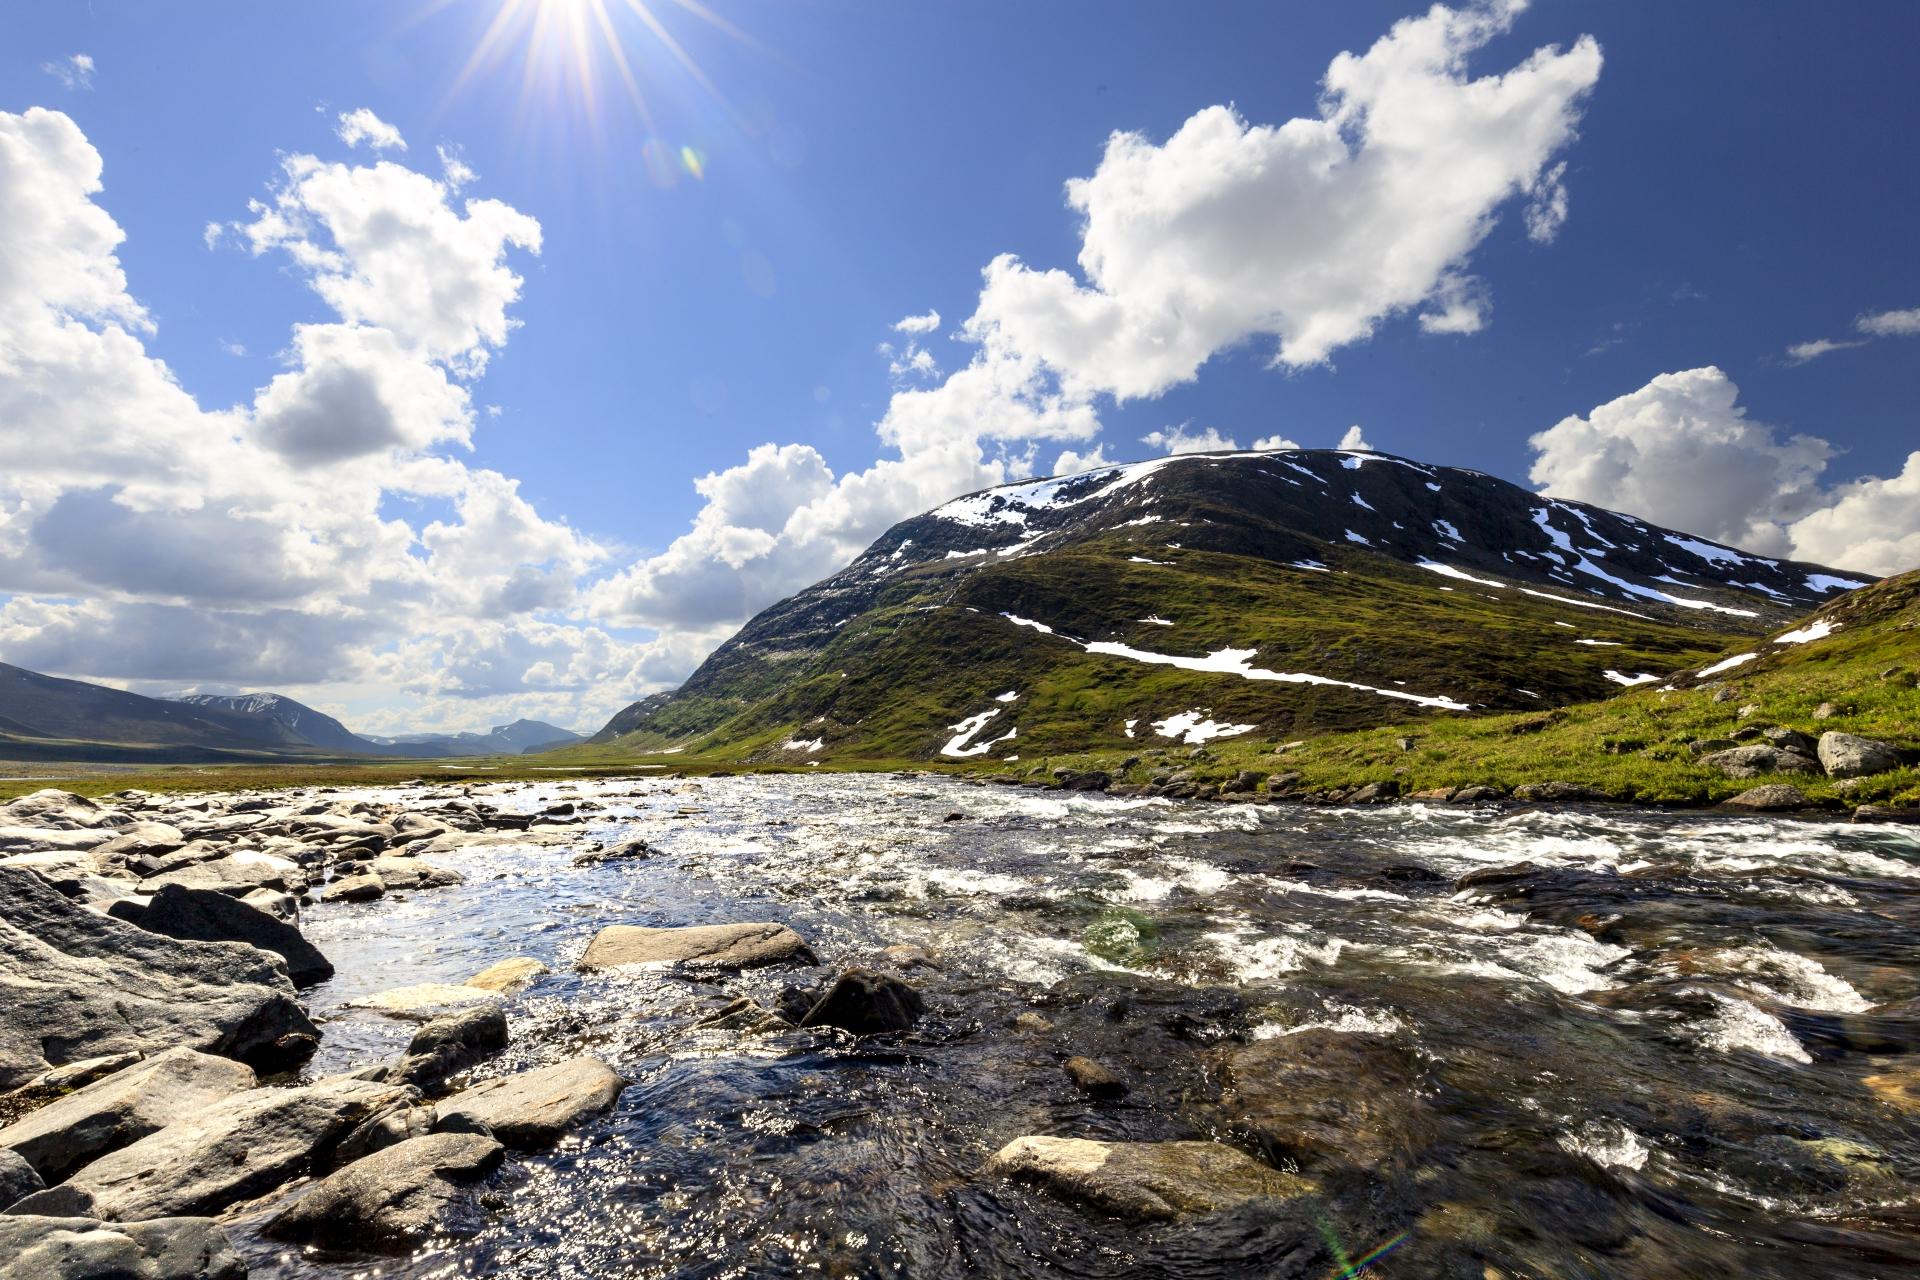 Tjäktjajåkka vor einerm Gipfel der Sälka-Gruppe